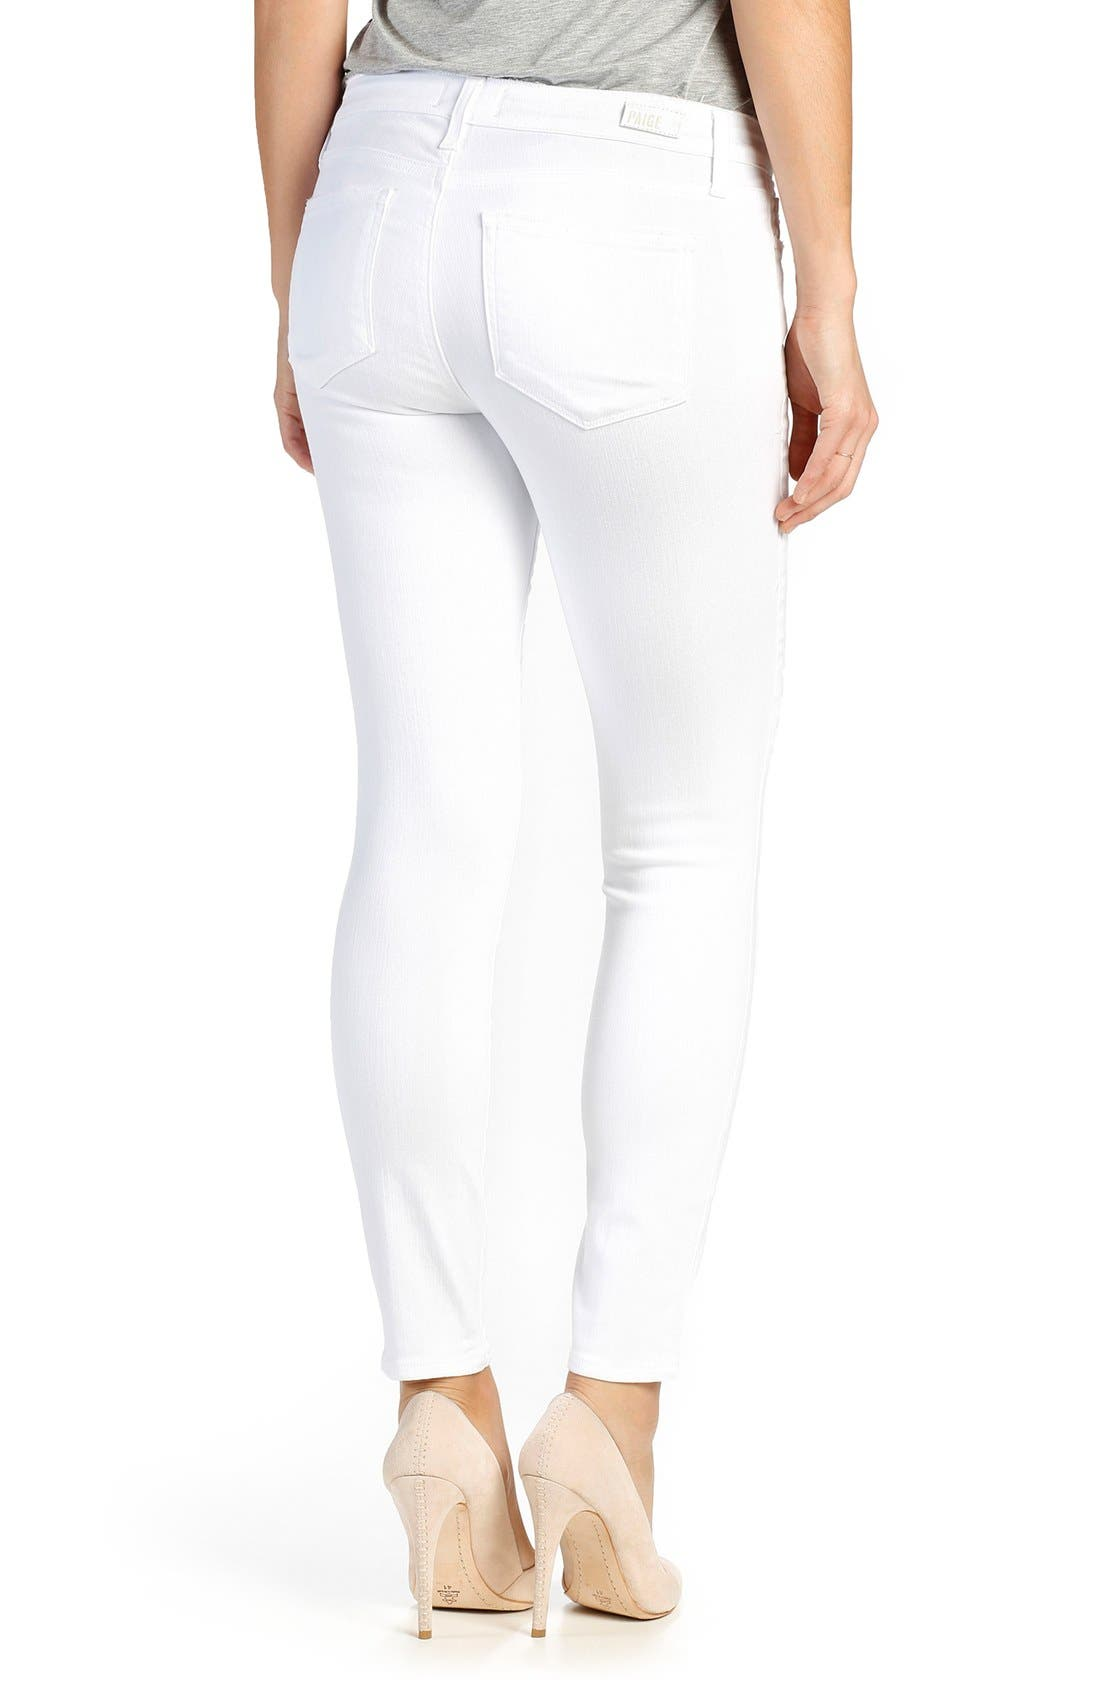 PAIGE, Verdugo Ankle Skinny Jeans, Alternate thumbnail 5, color, 100